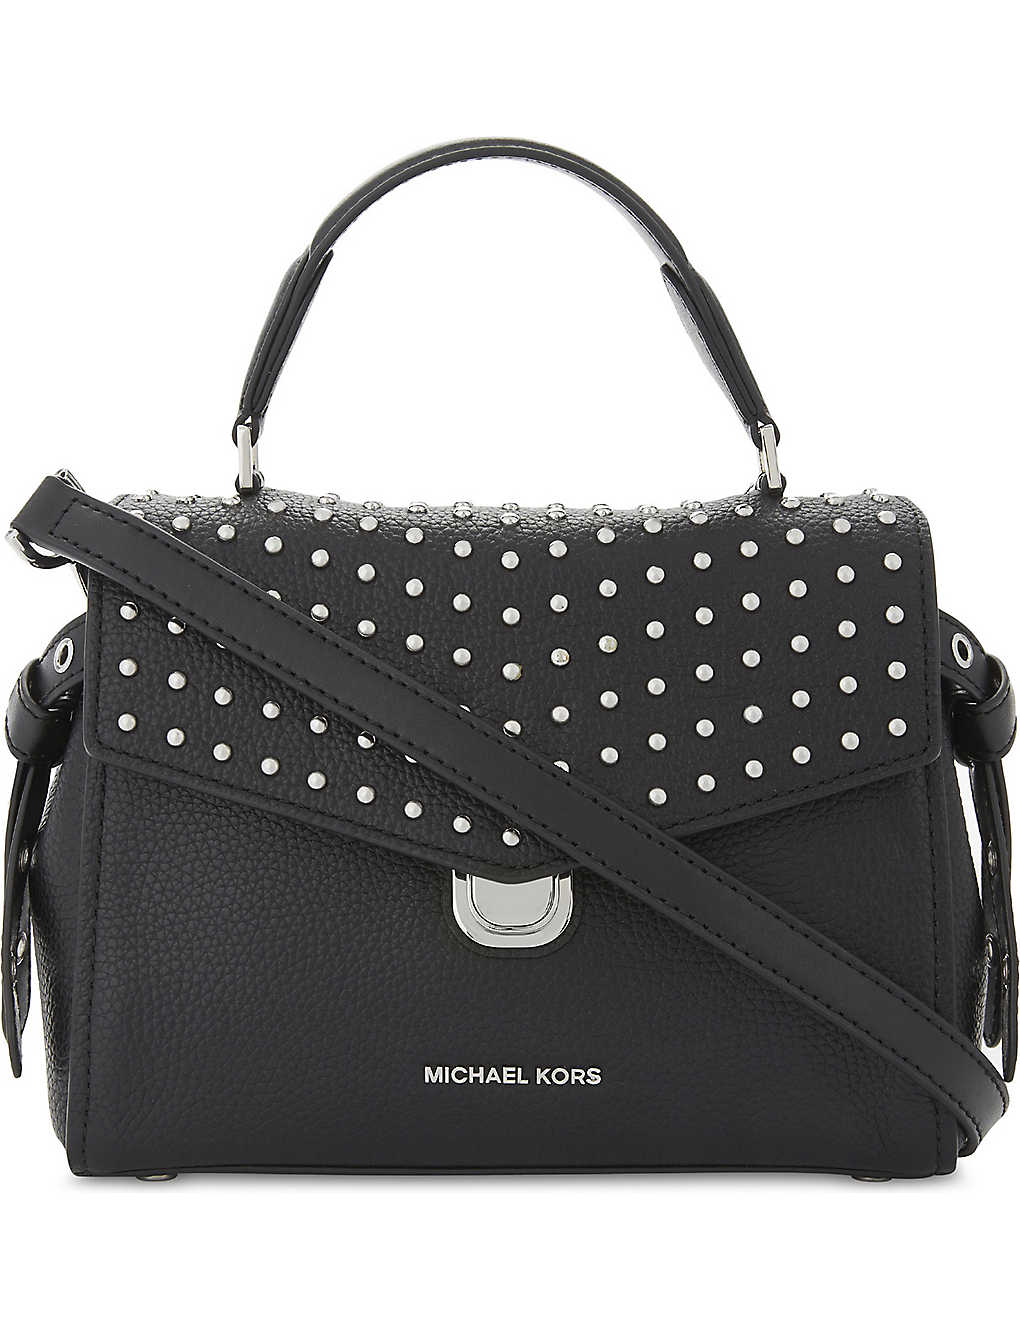 fdf82b21e5b0 MICHAEL MICHAEL KORS - Bristol studded leather satchel bag ...